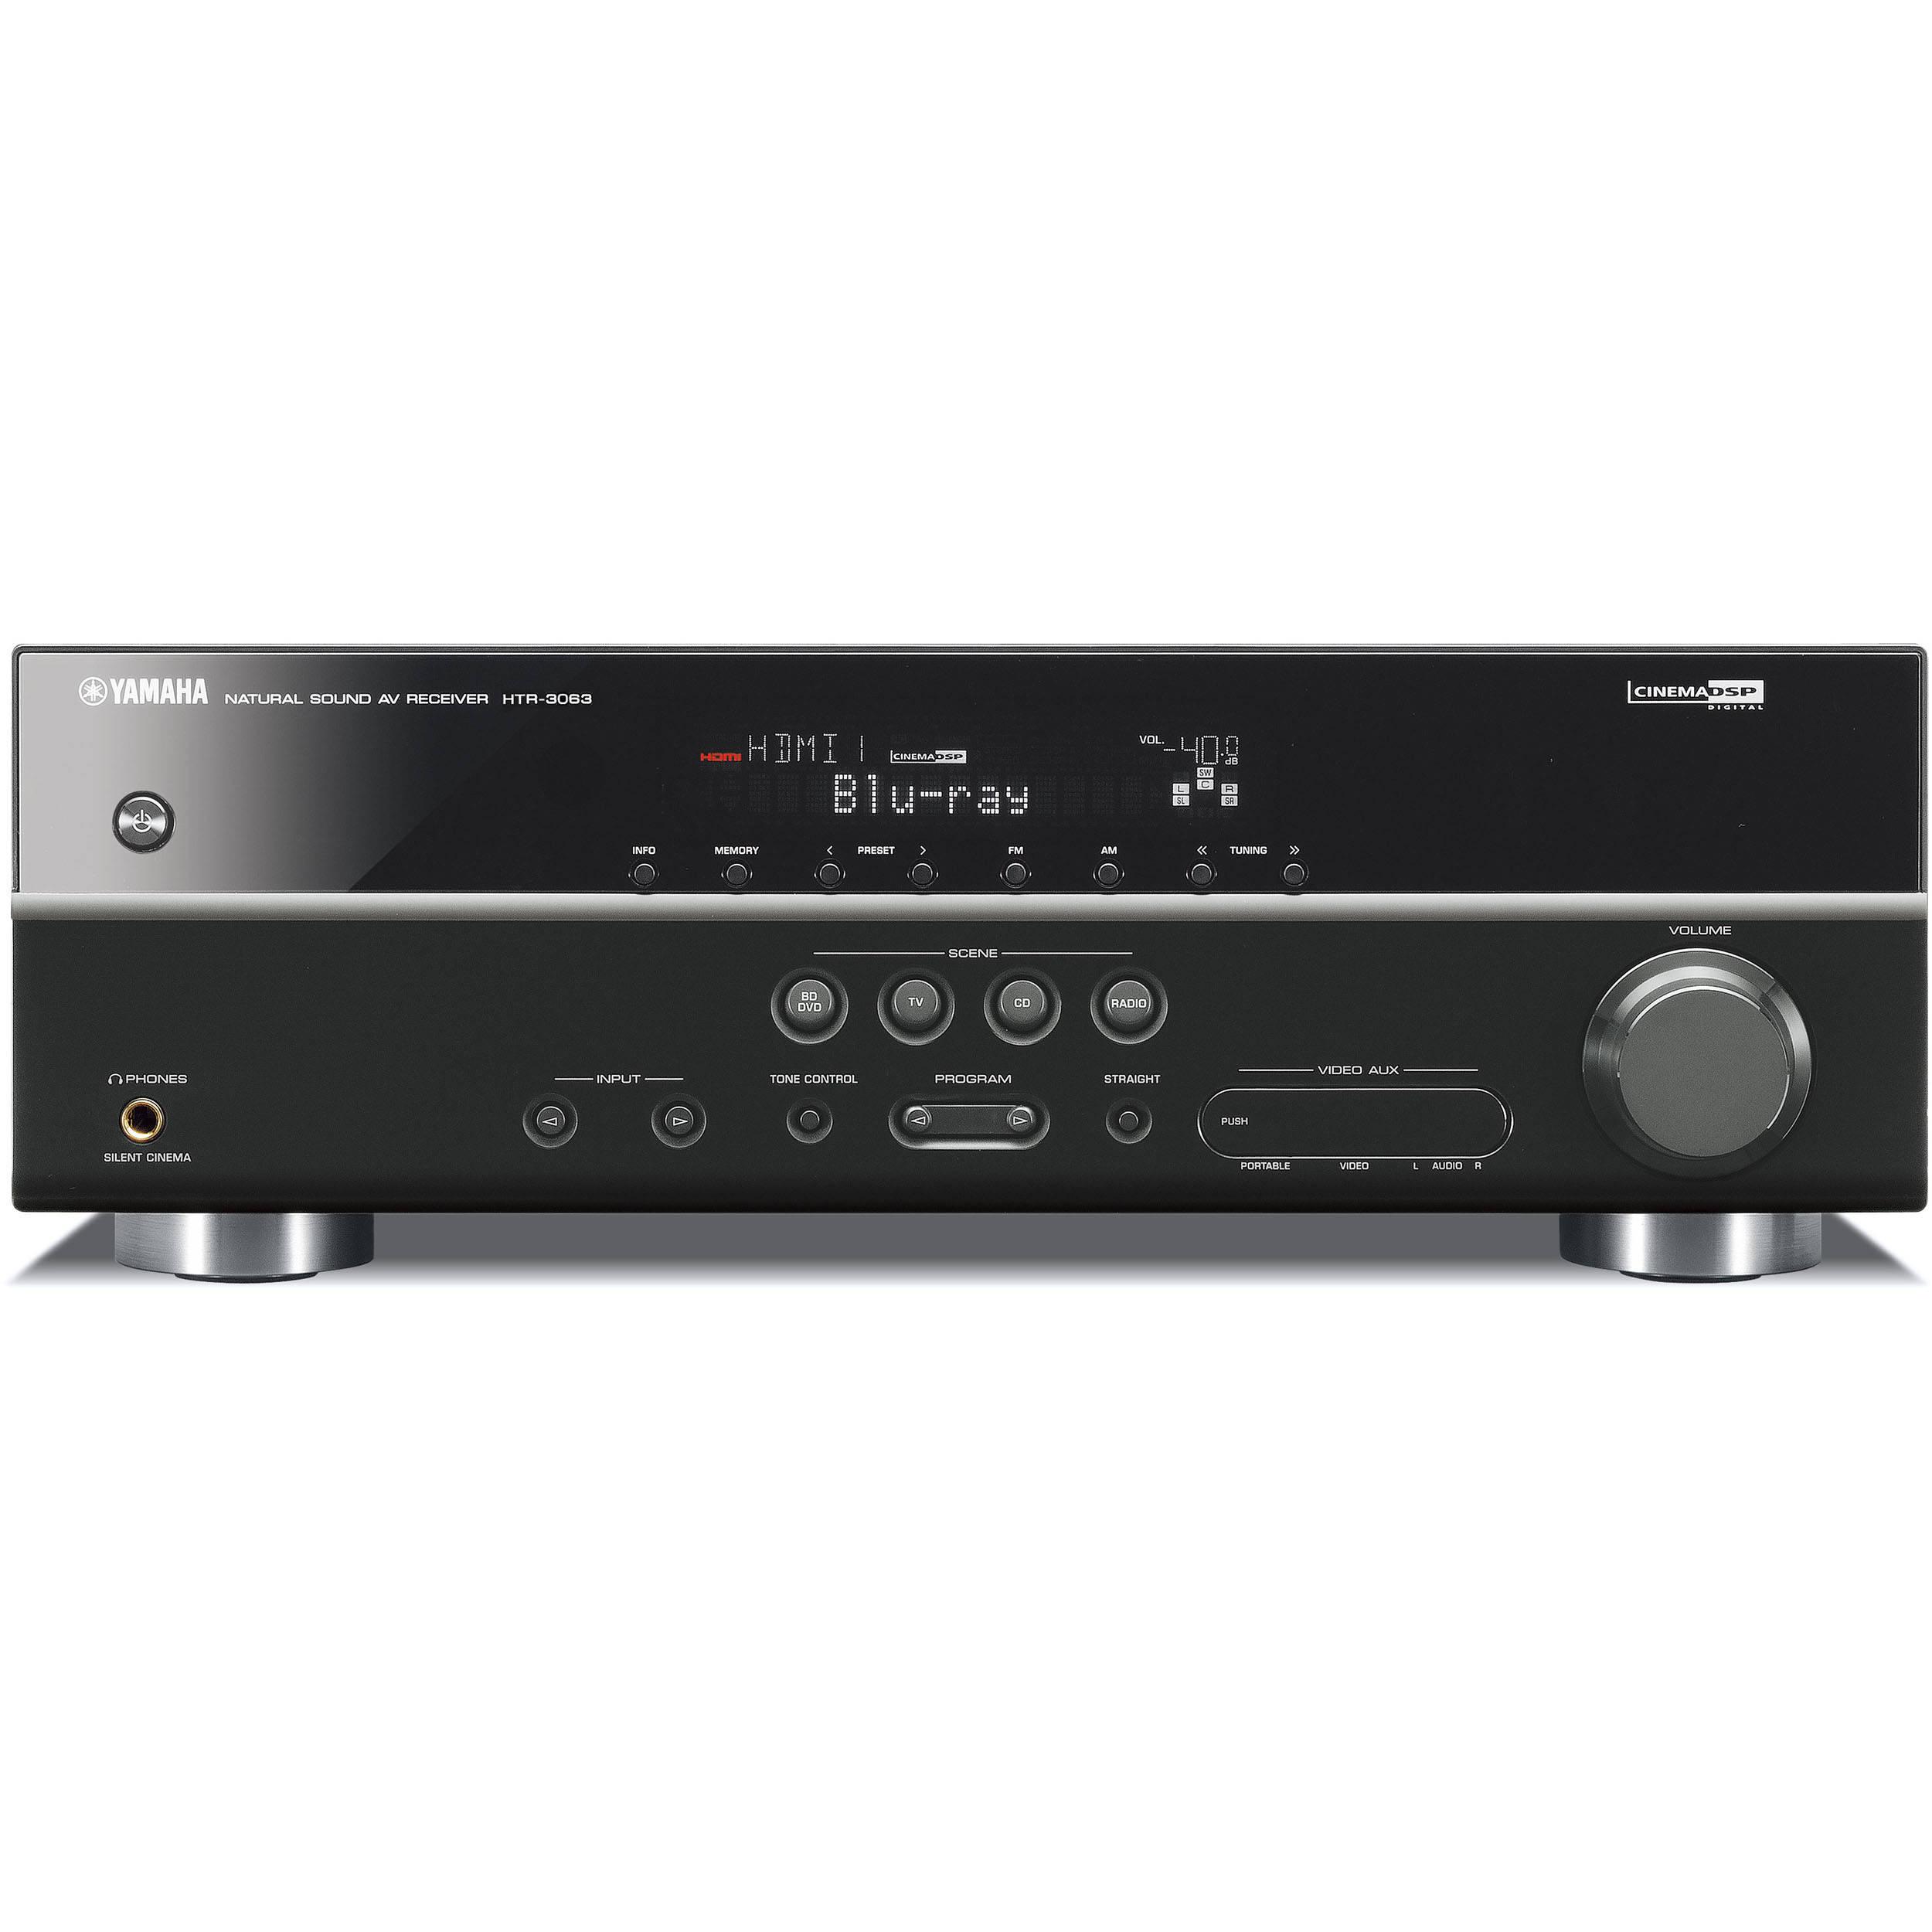 Yamaha htr 3063 5 1 channel home theater receiver htr for Yamaha warranty registration